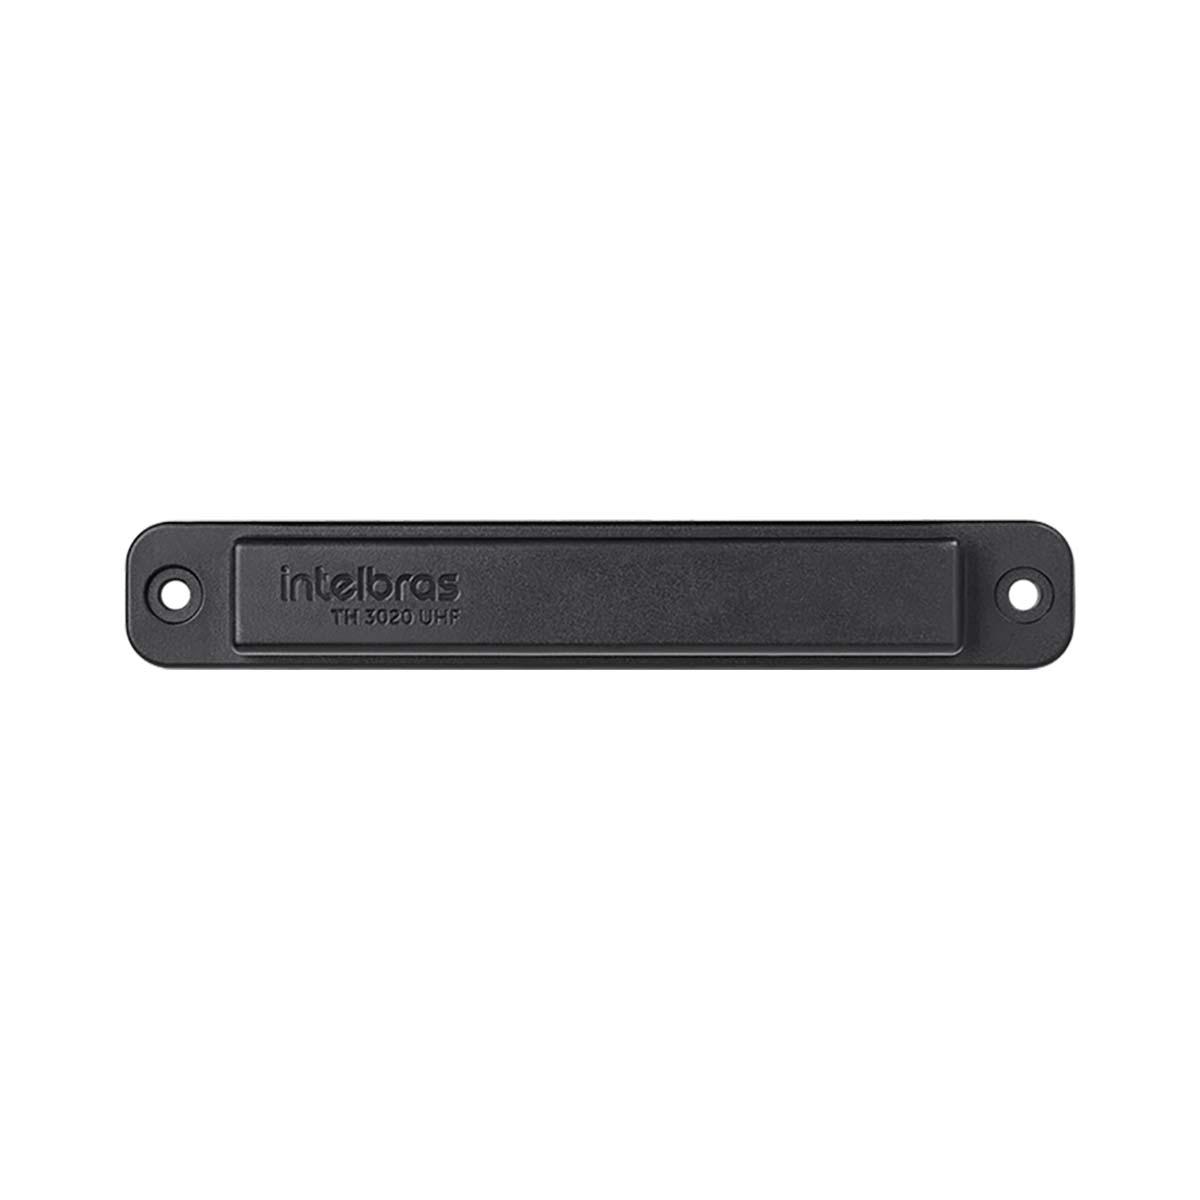 Kit 10 Etiqueta Veicular Intelbras Rfid 900mhz Th 3020 Uhf